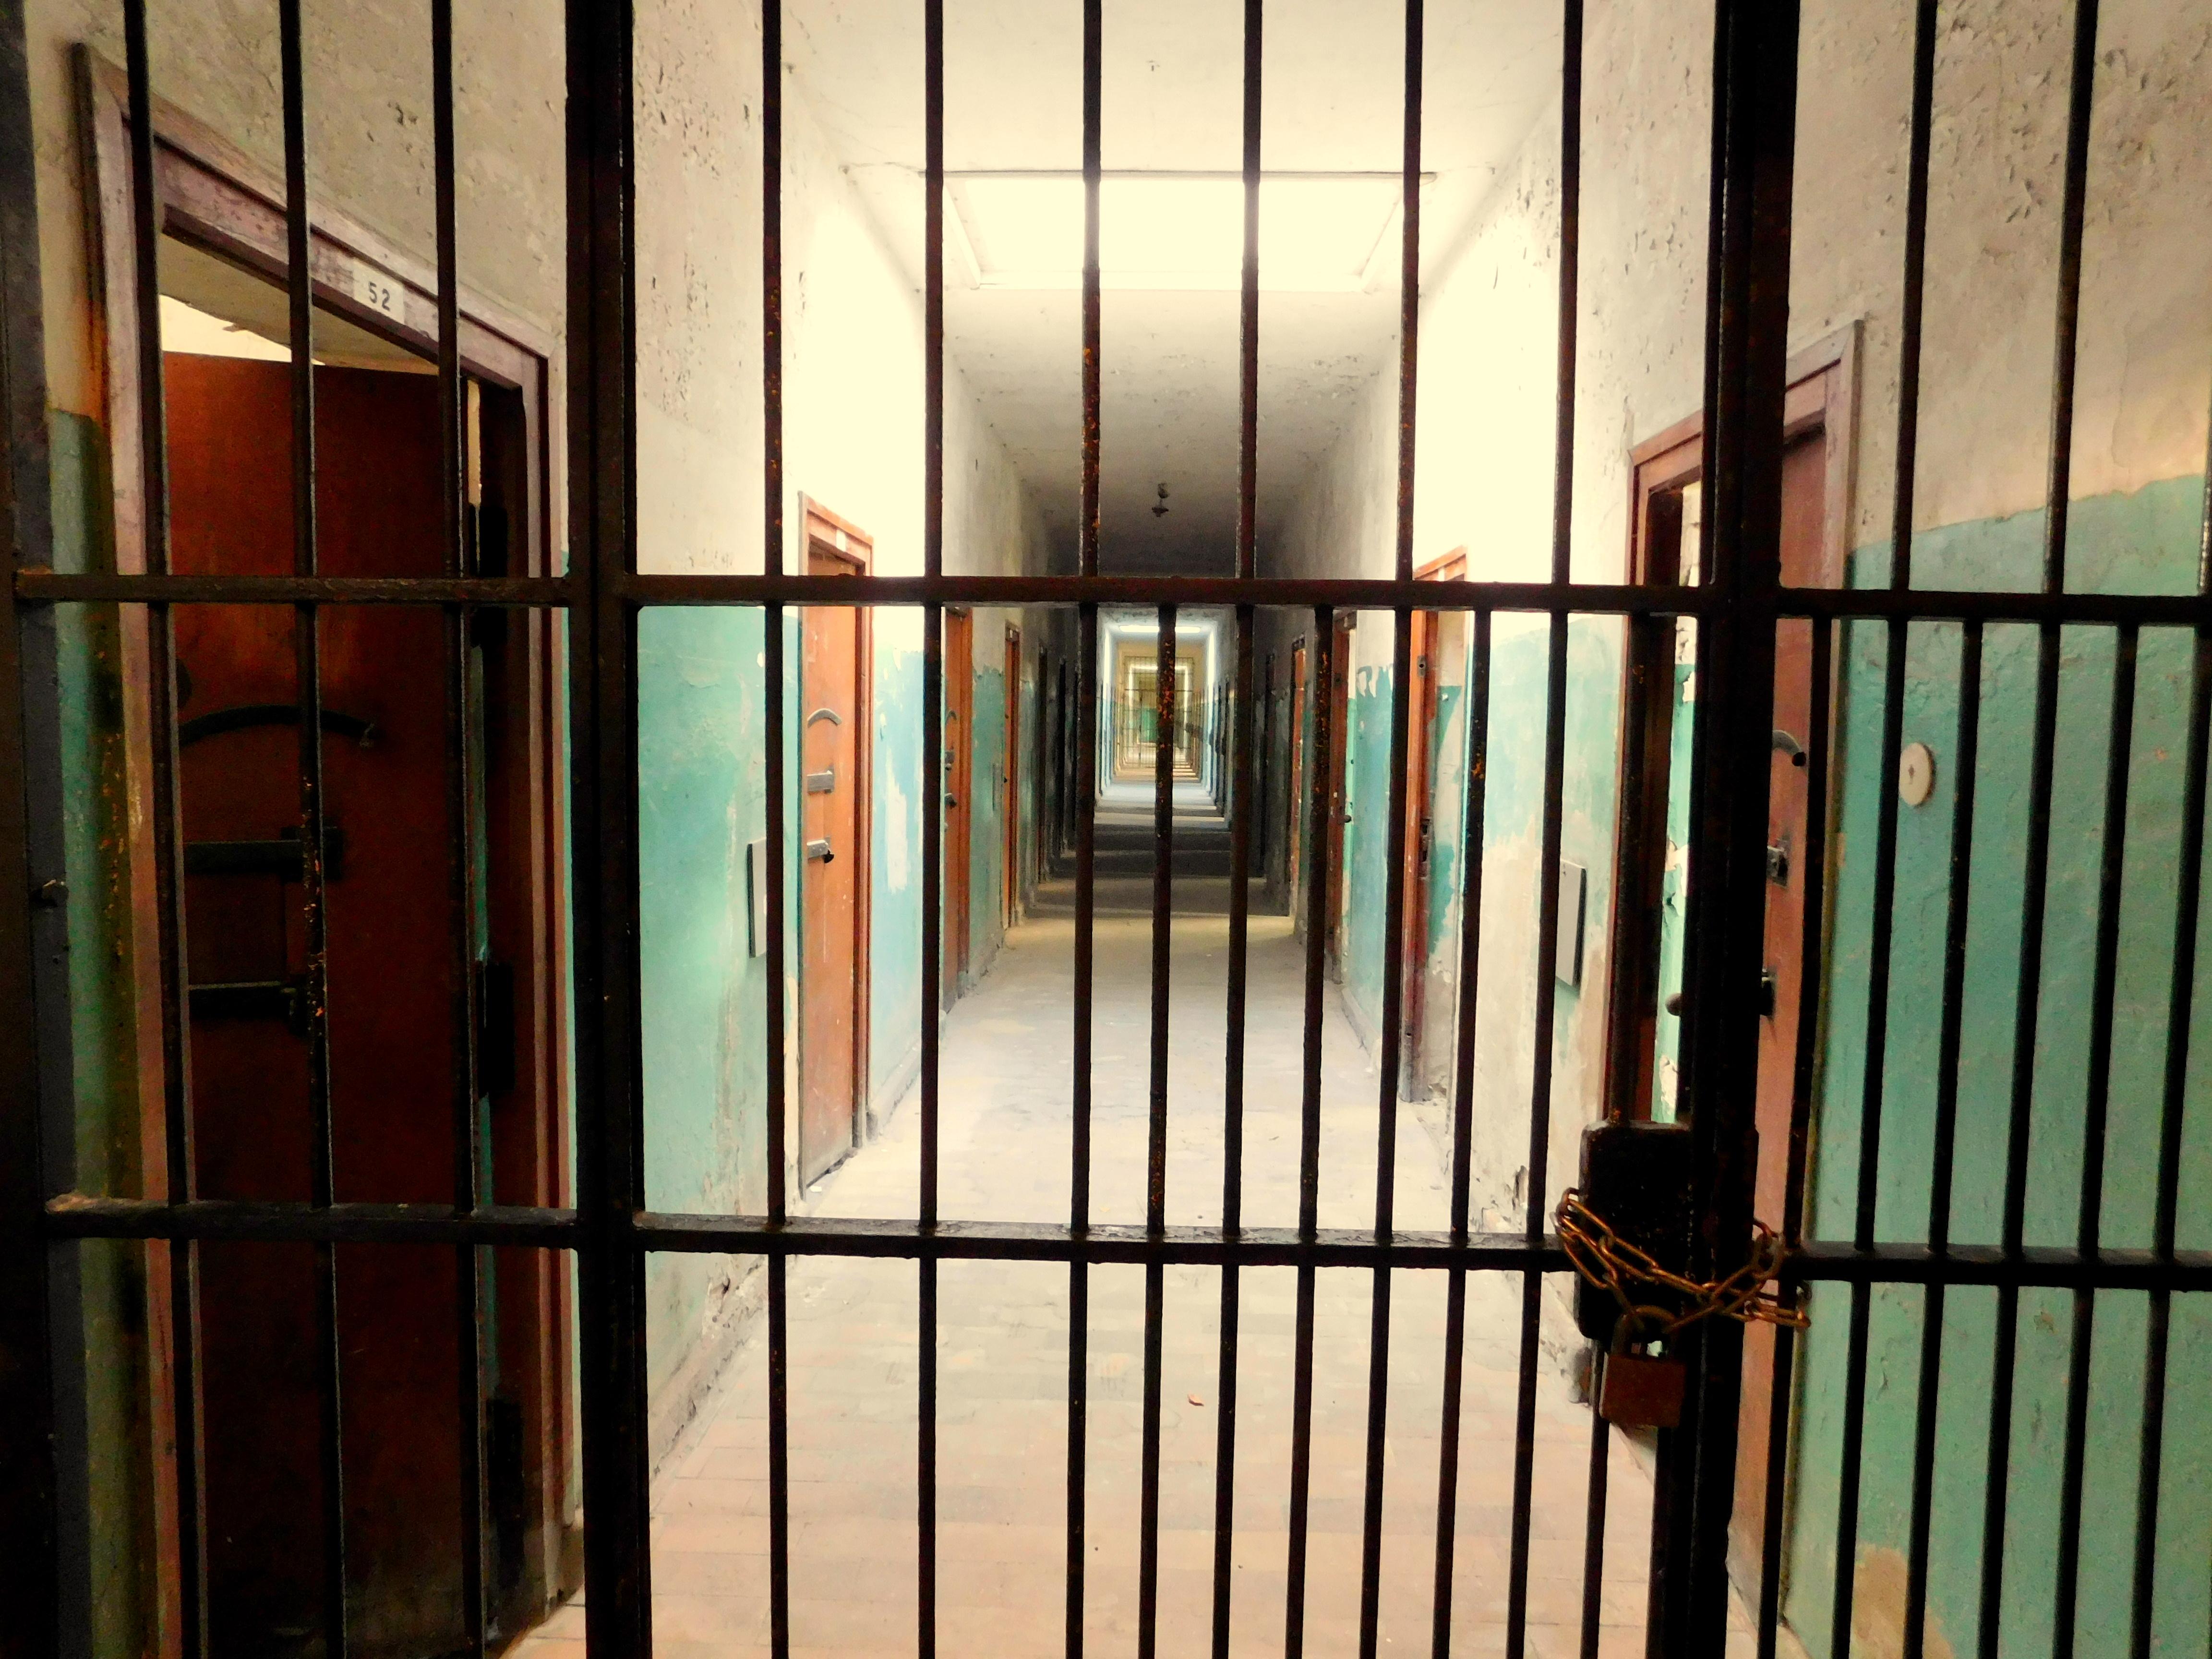 prison dachau